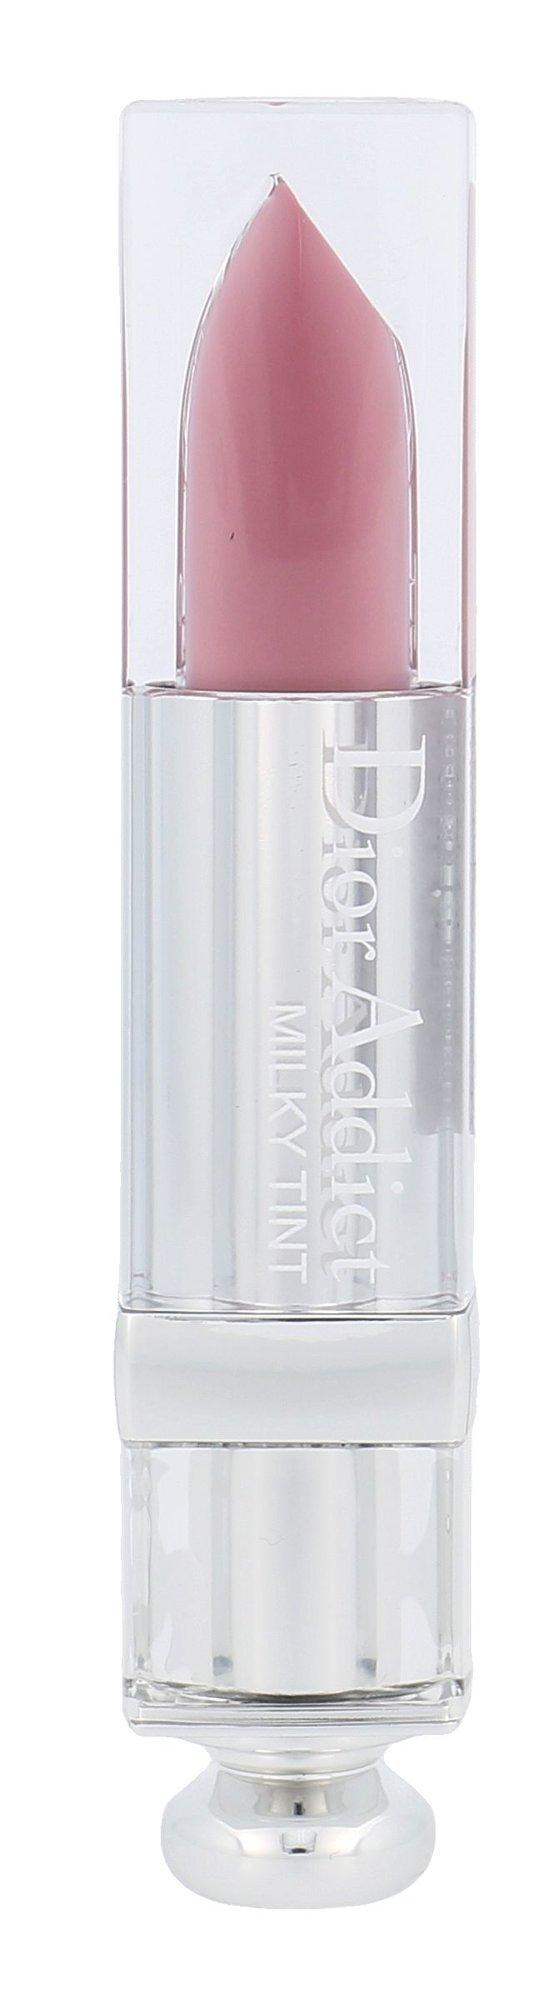 Christian Dior Addict Cosmetic 5,5ml 286 Milky Plum Milky Tint